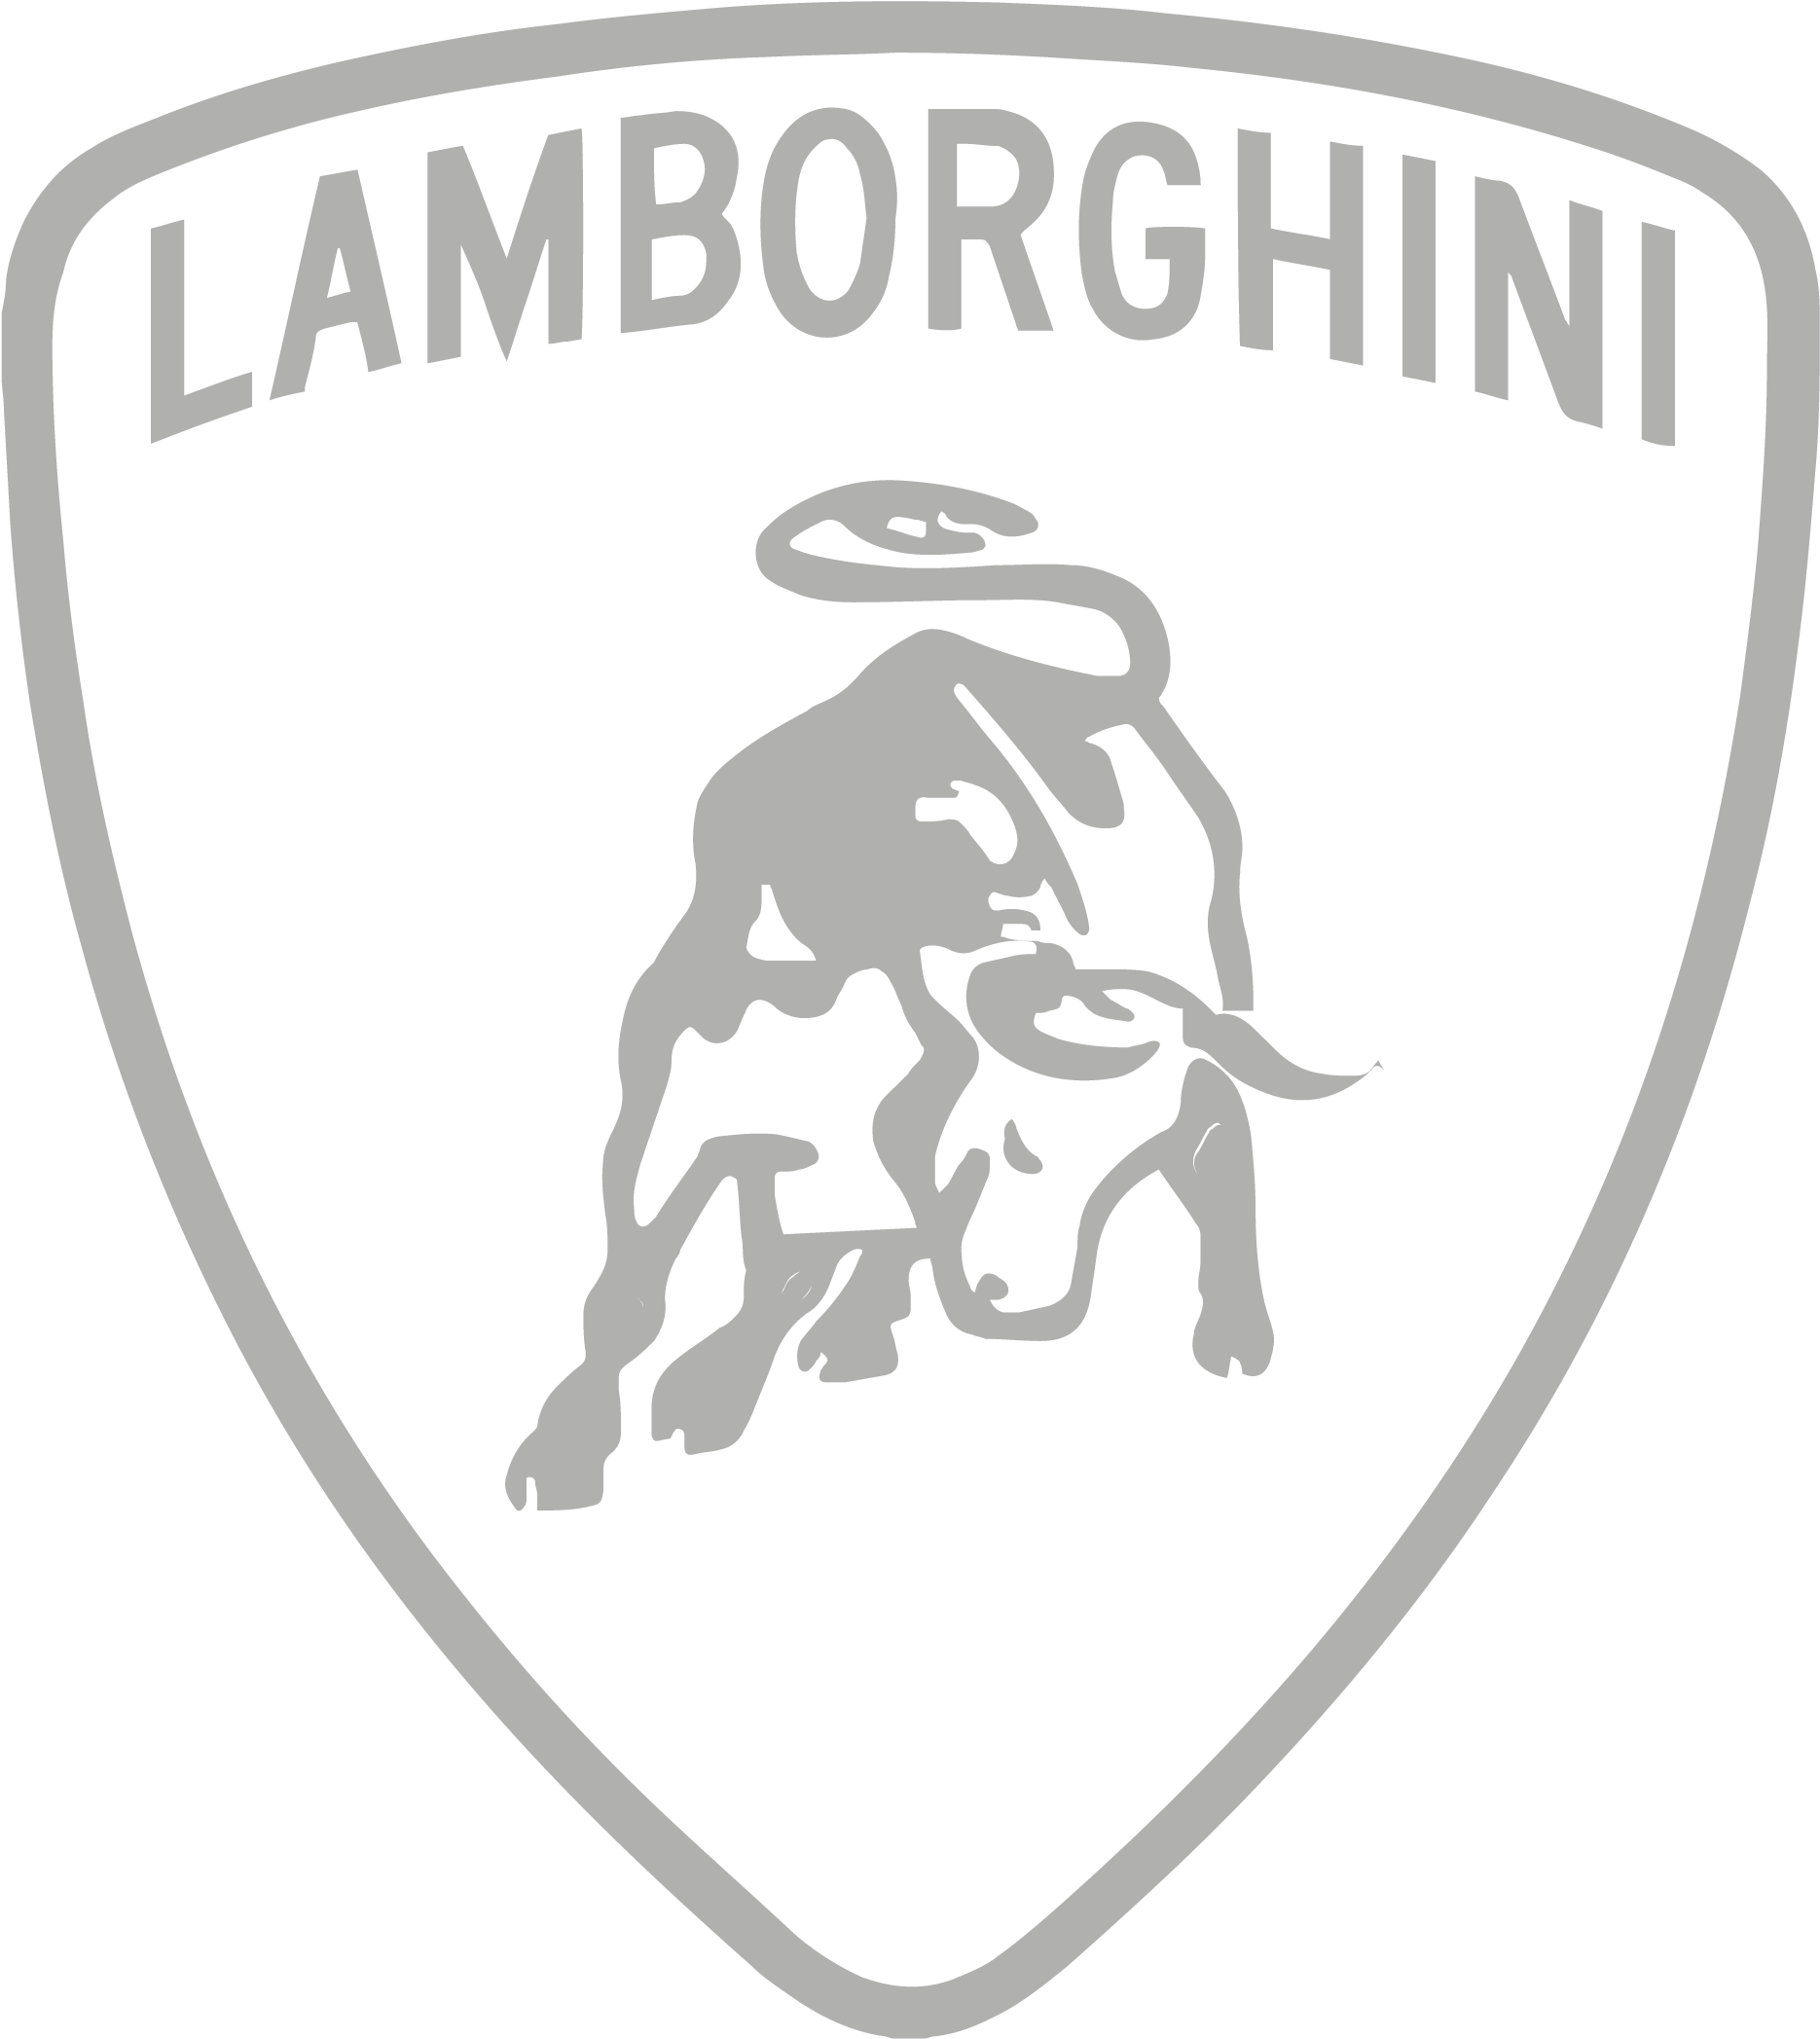 Lamborghini Logo White Background